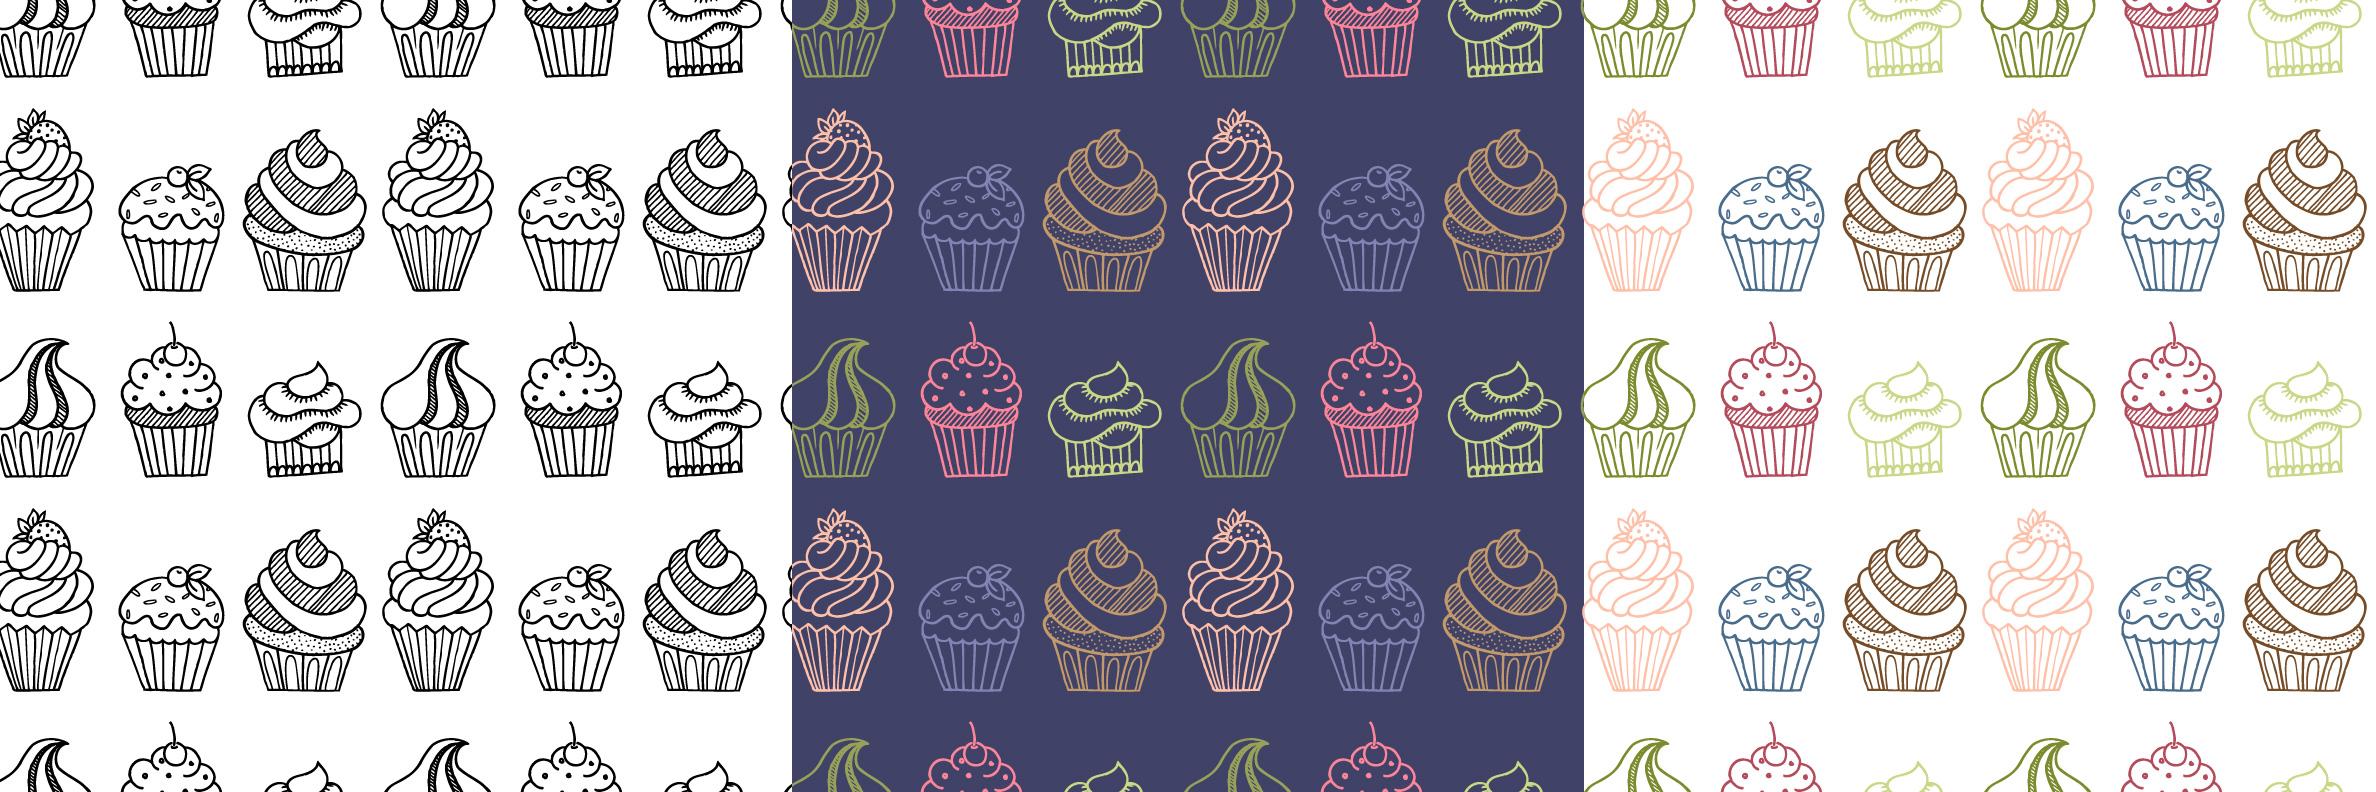 CupcakesIllustration.jpg